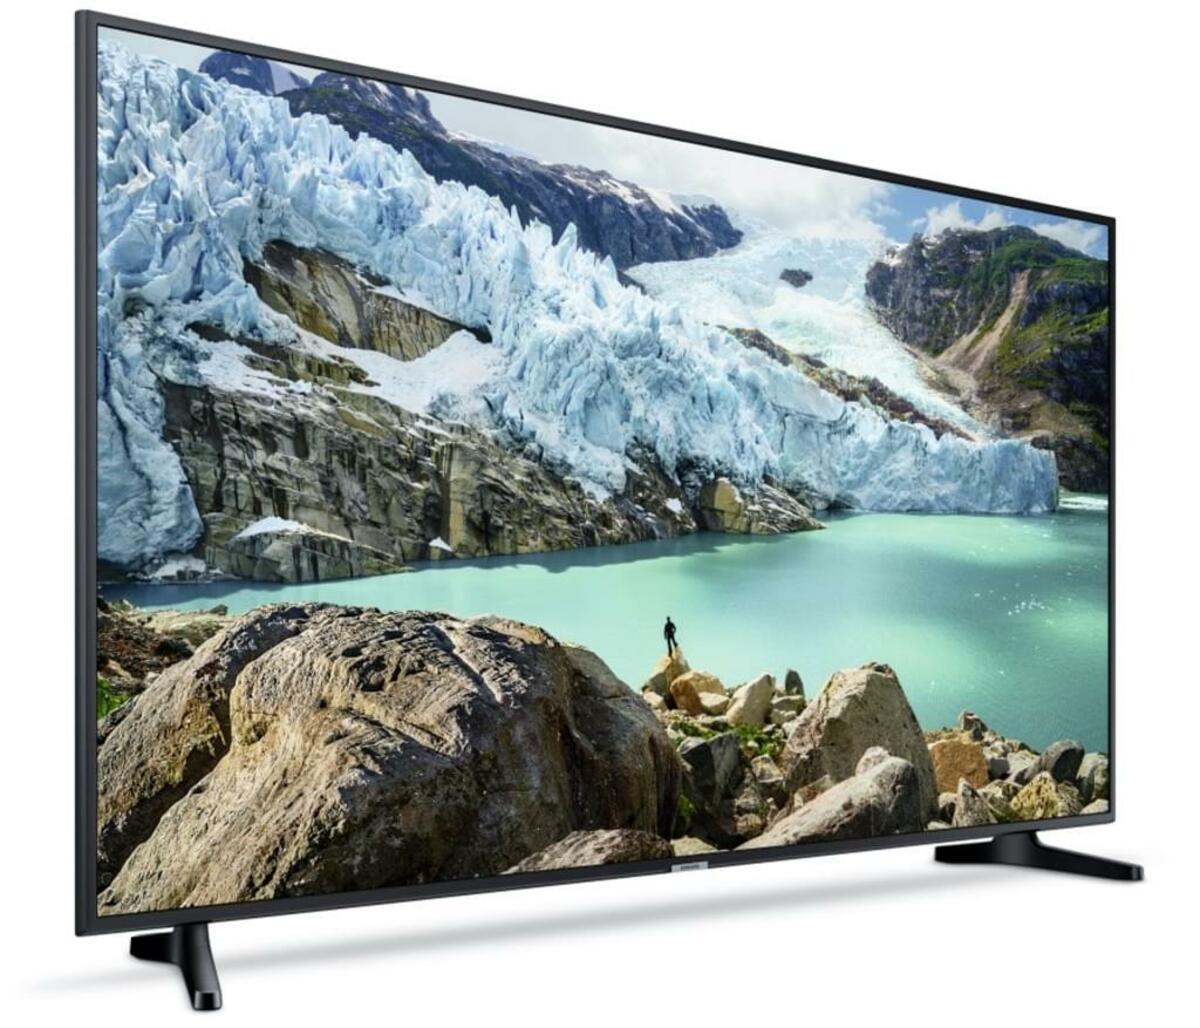 Bild 3 von Samsung 4K Ultra HD LED 125 cm (50 Zoll) UE50RU7099 UHD Smart TV, Triple Tuner, HDR10+